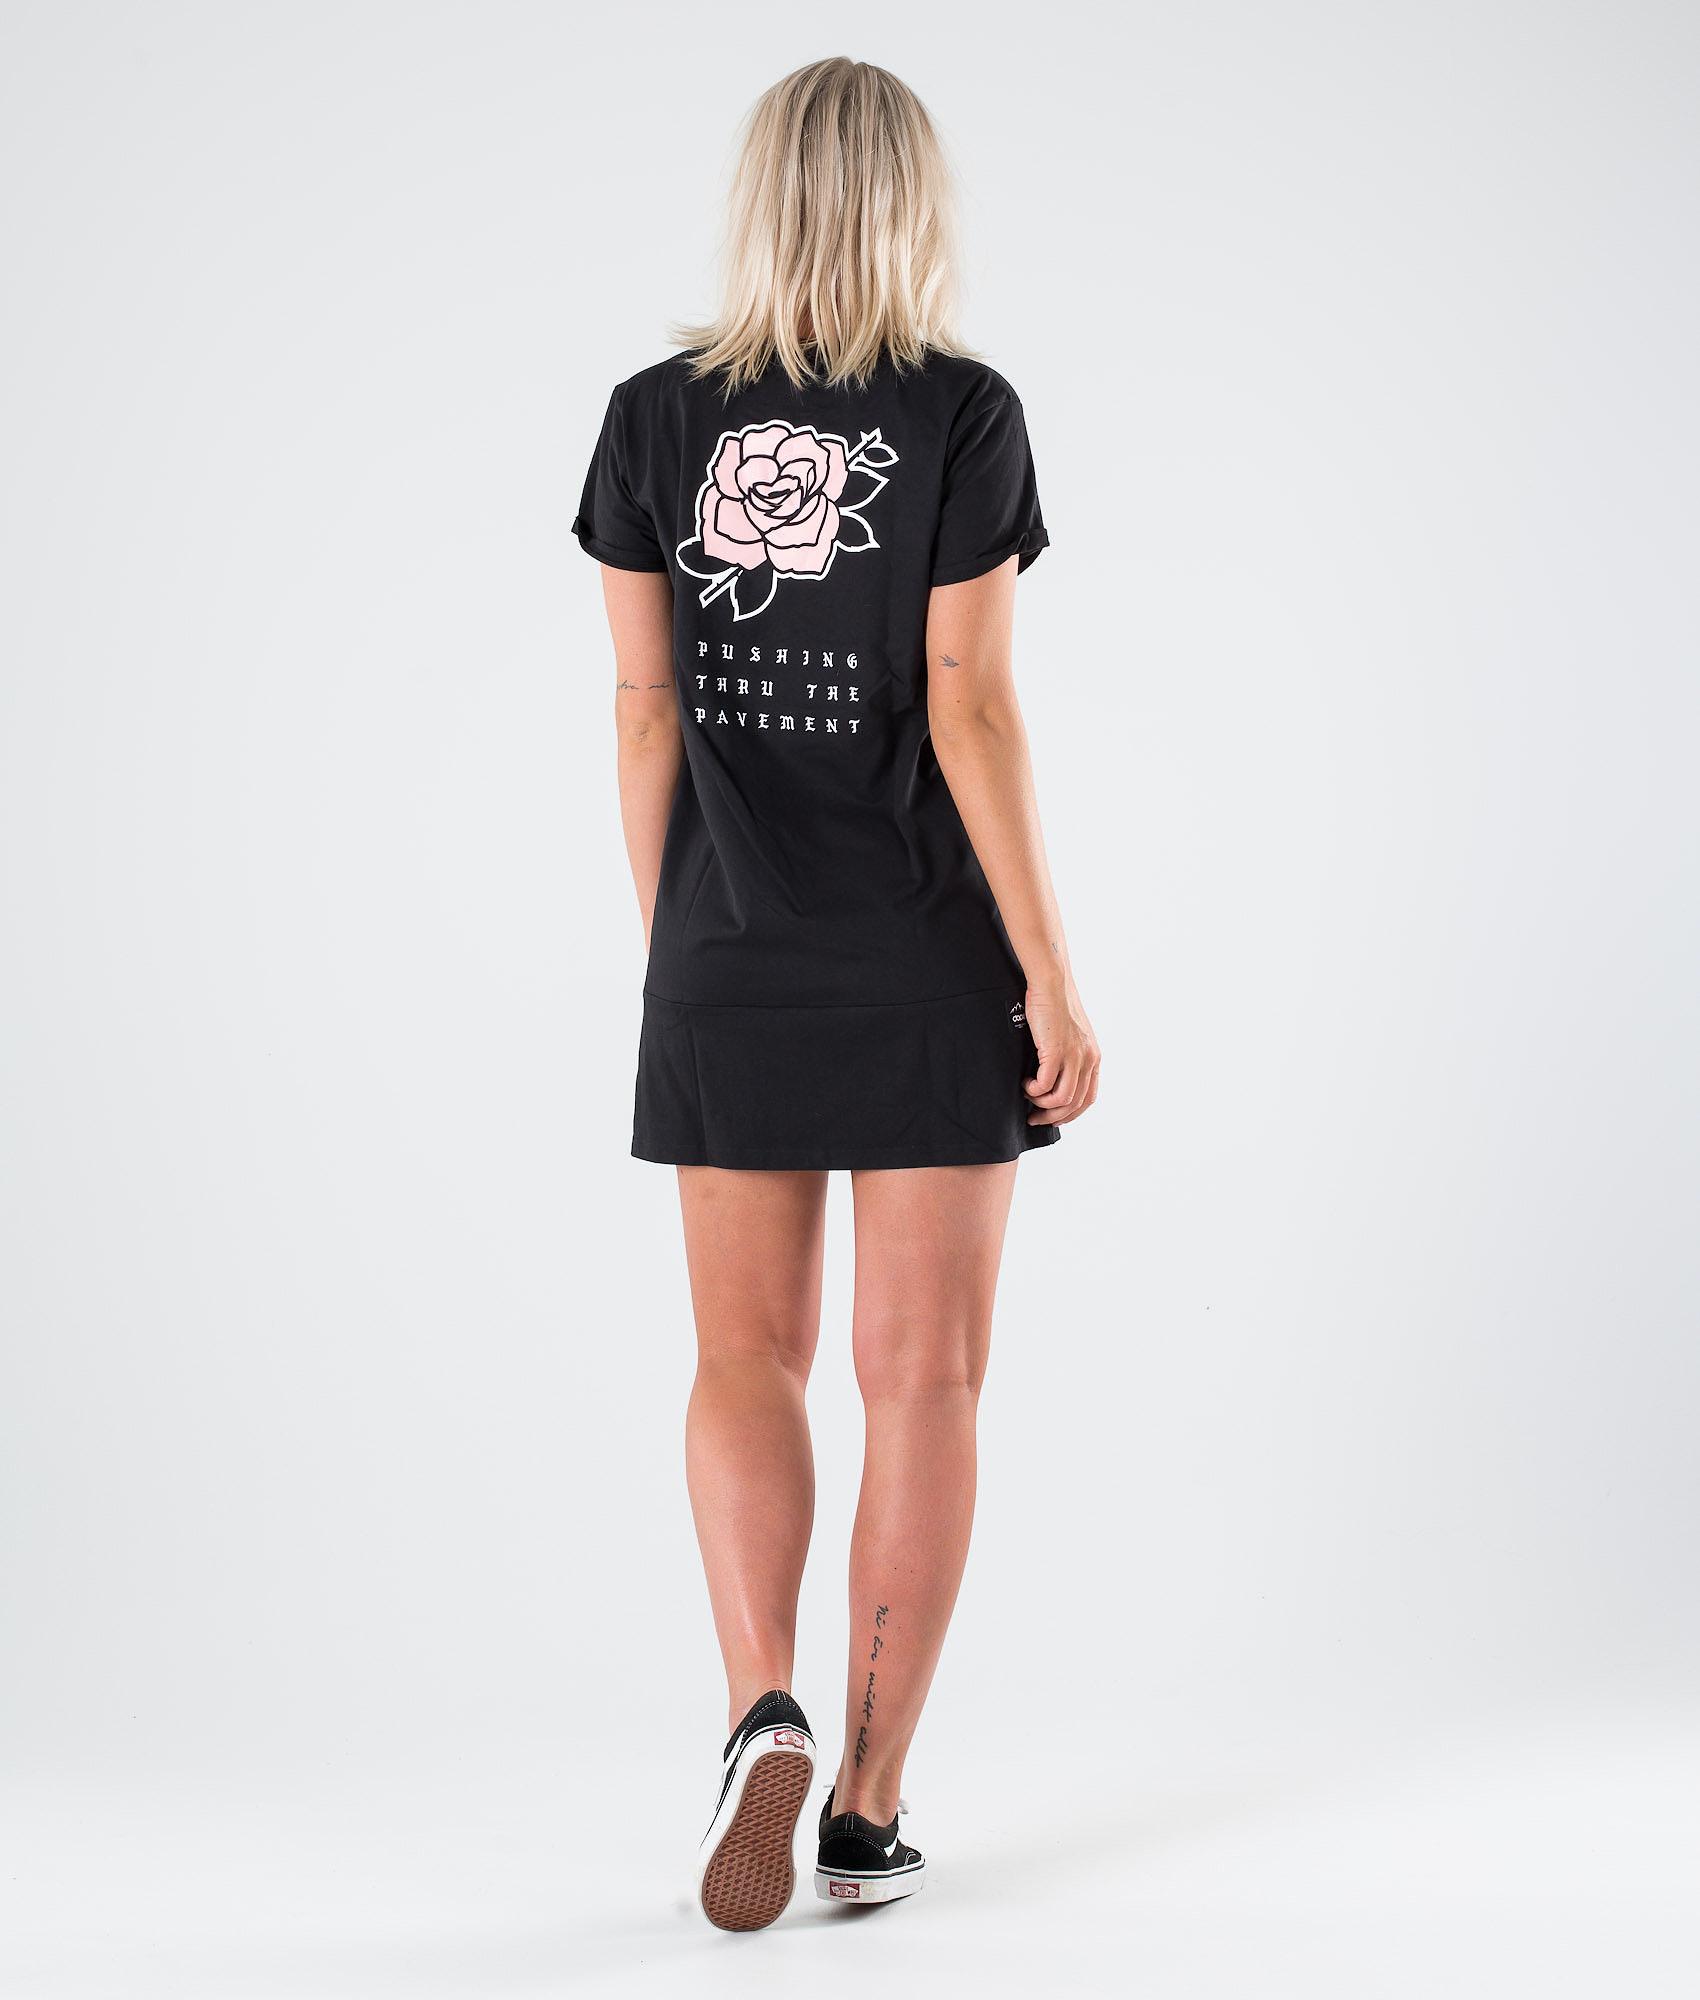 c0c5f25846ac Klänningar Dam Streetwear | Fri Frakt | Ridestore.se